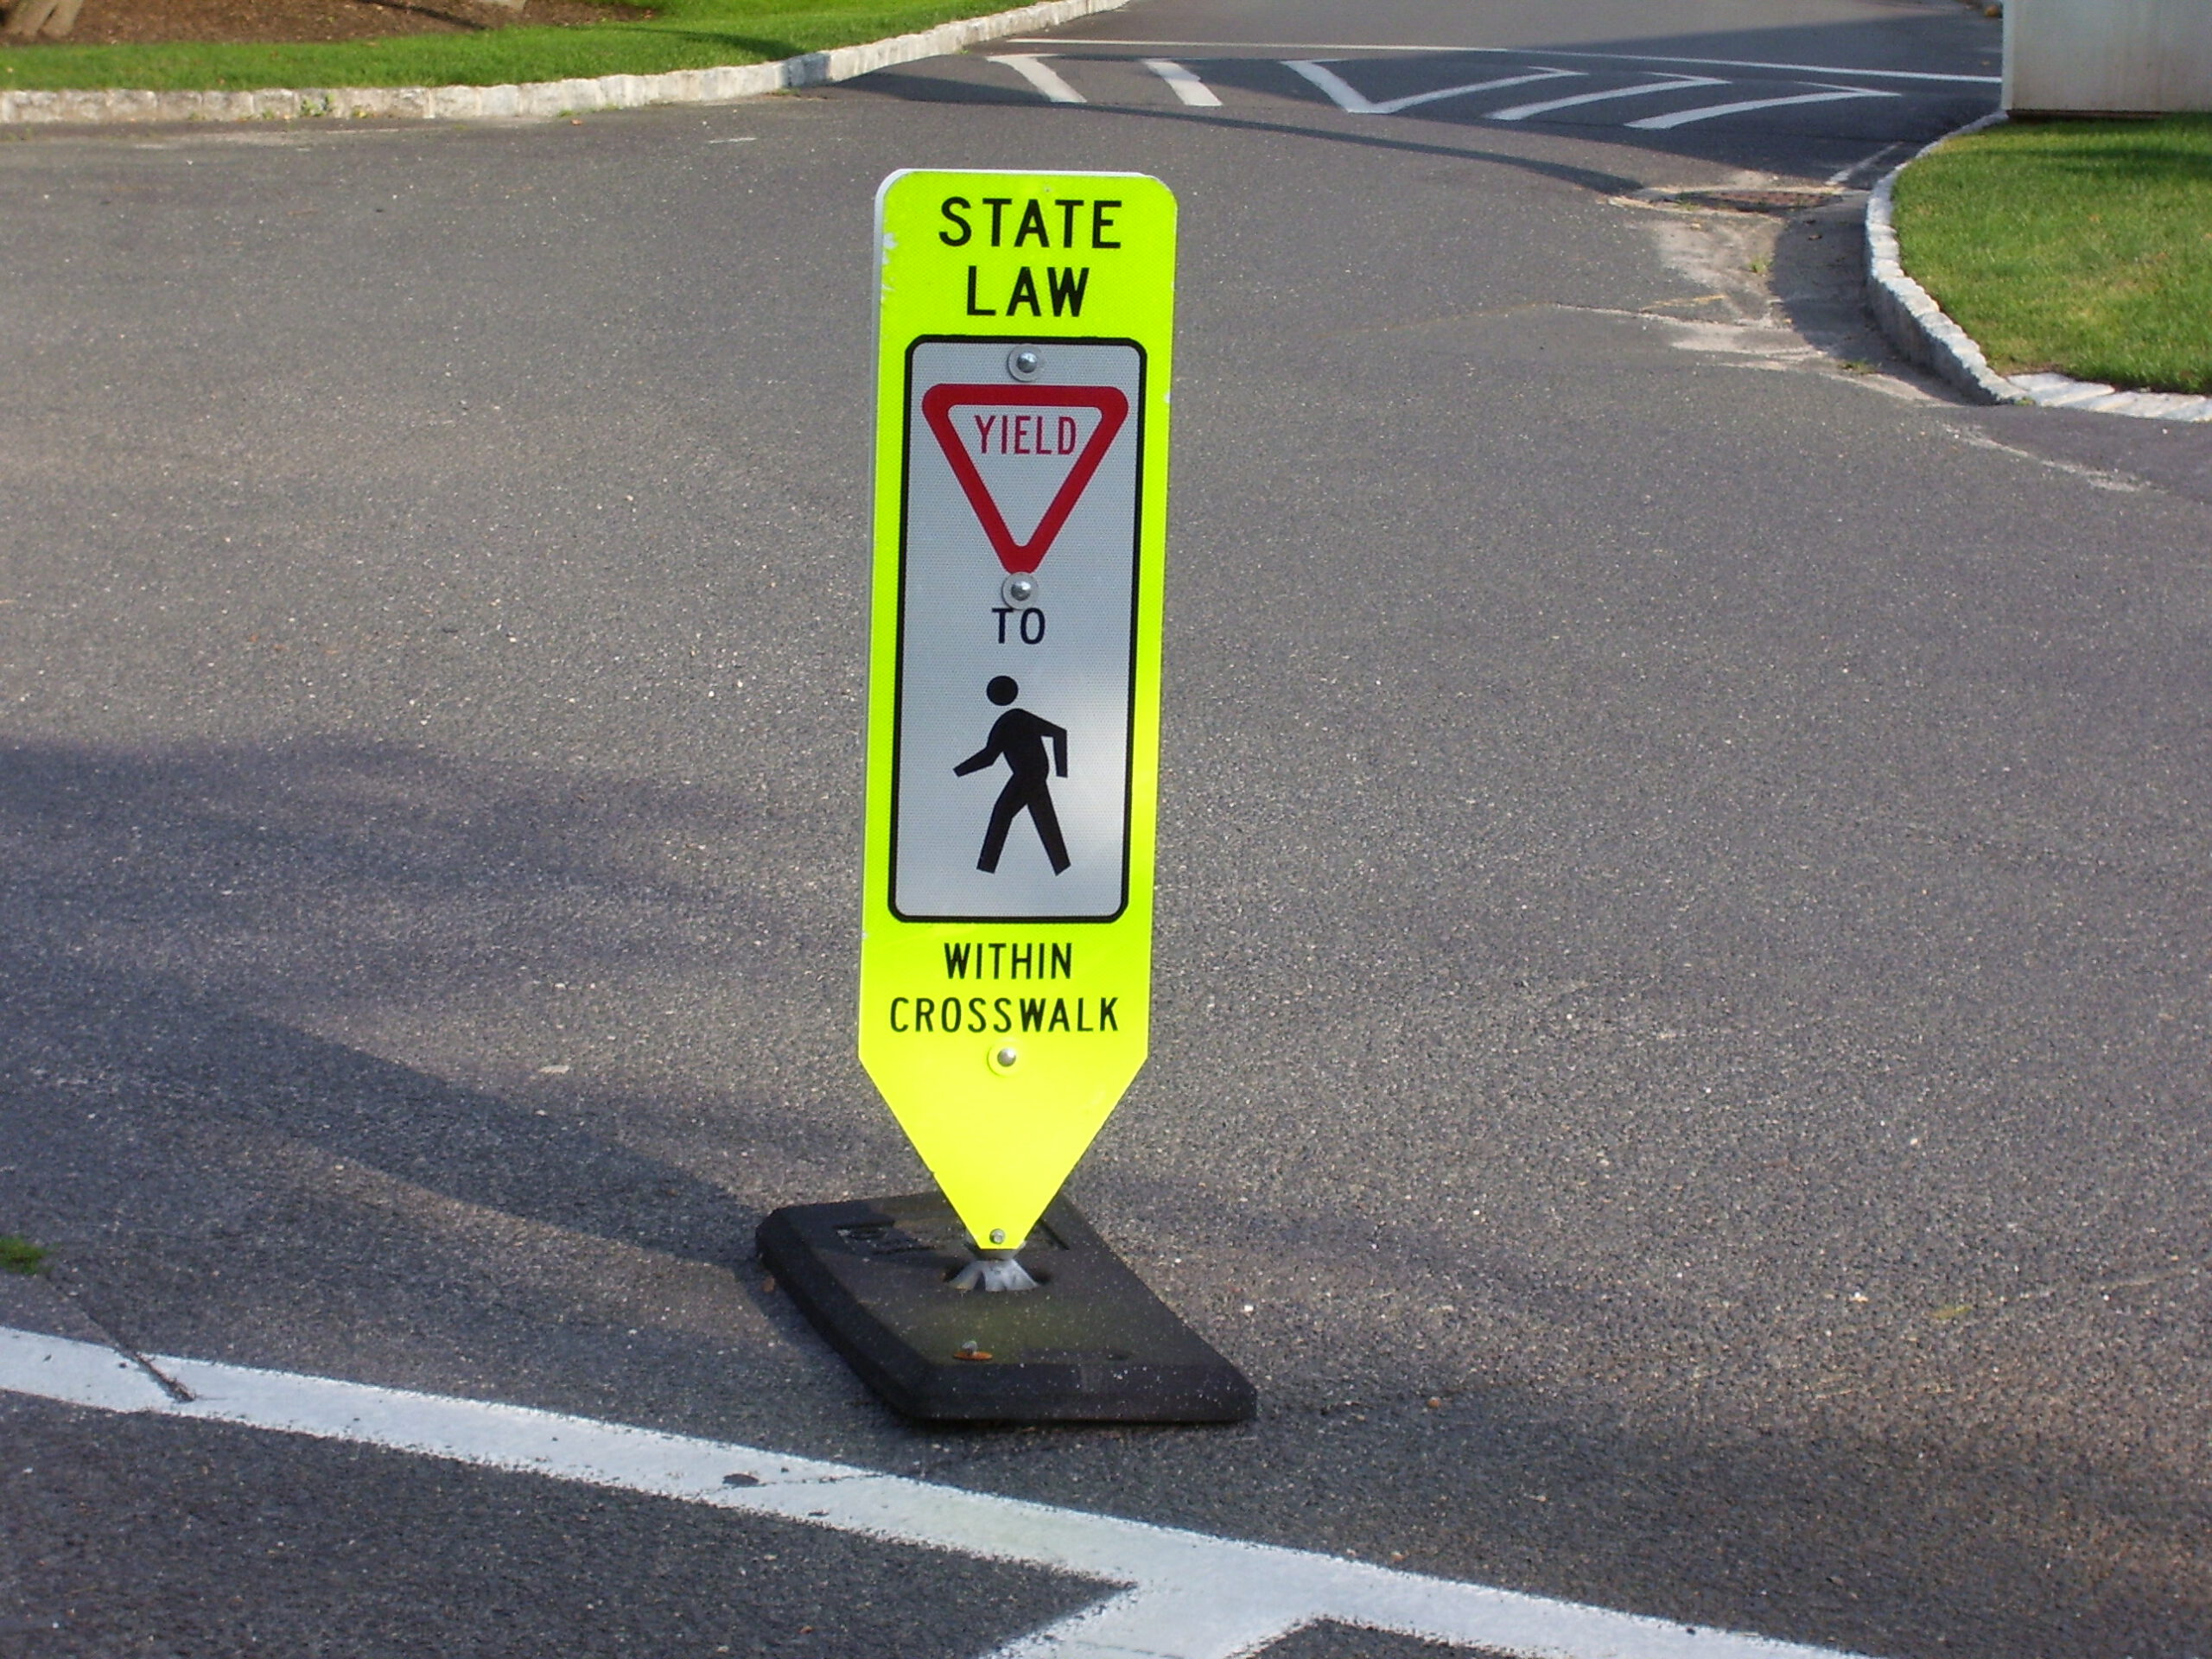 LEH: Pedestrian Struck- Medevac Landing for Injuries